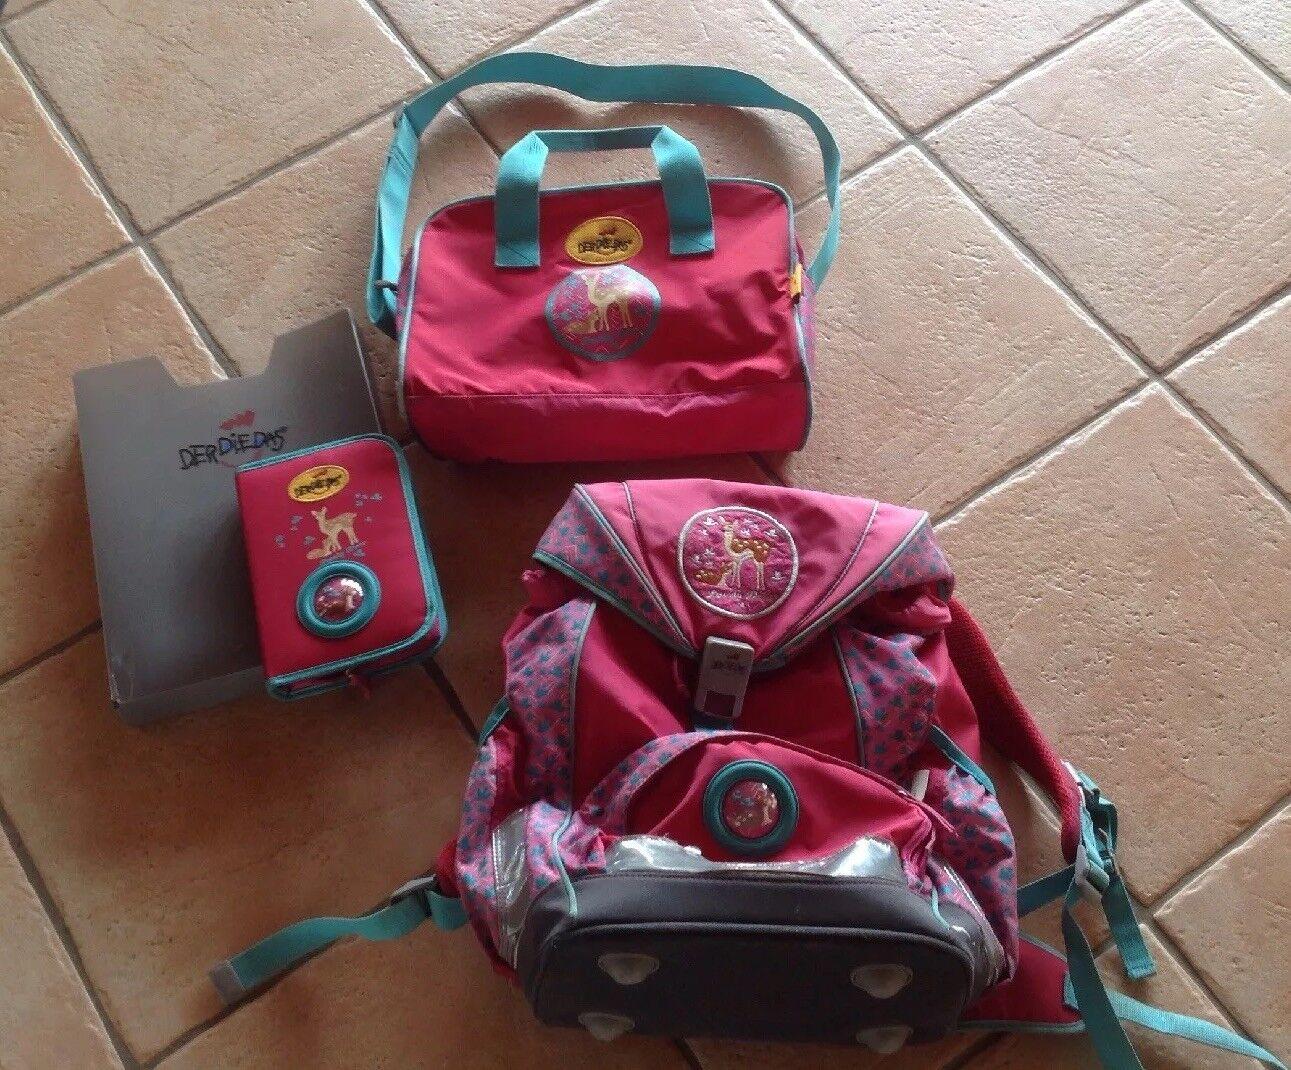 Der Die Das Das Das Schulranzen Lovely Deer Reh Mädchen Rosa Rot Komplett Ranzen | Lebhaft  | Erlesene Materialien  | Überlegene Qualität  3e08e2